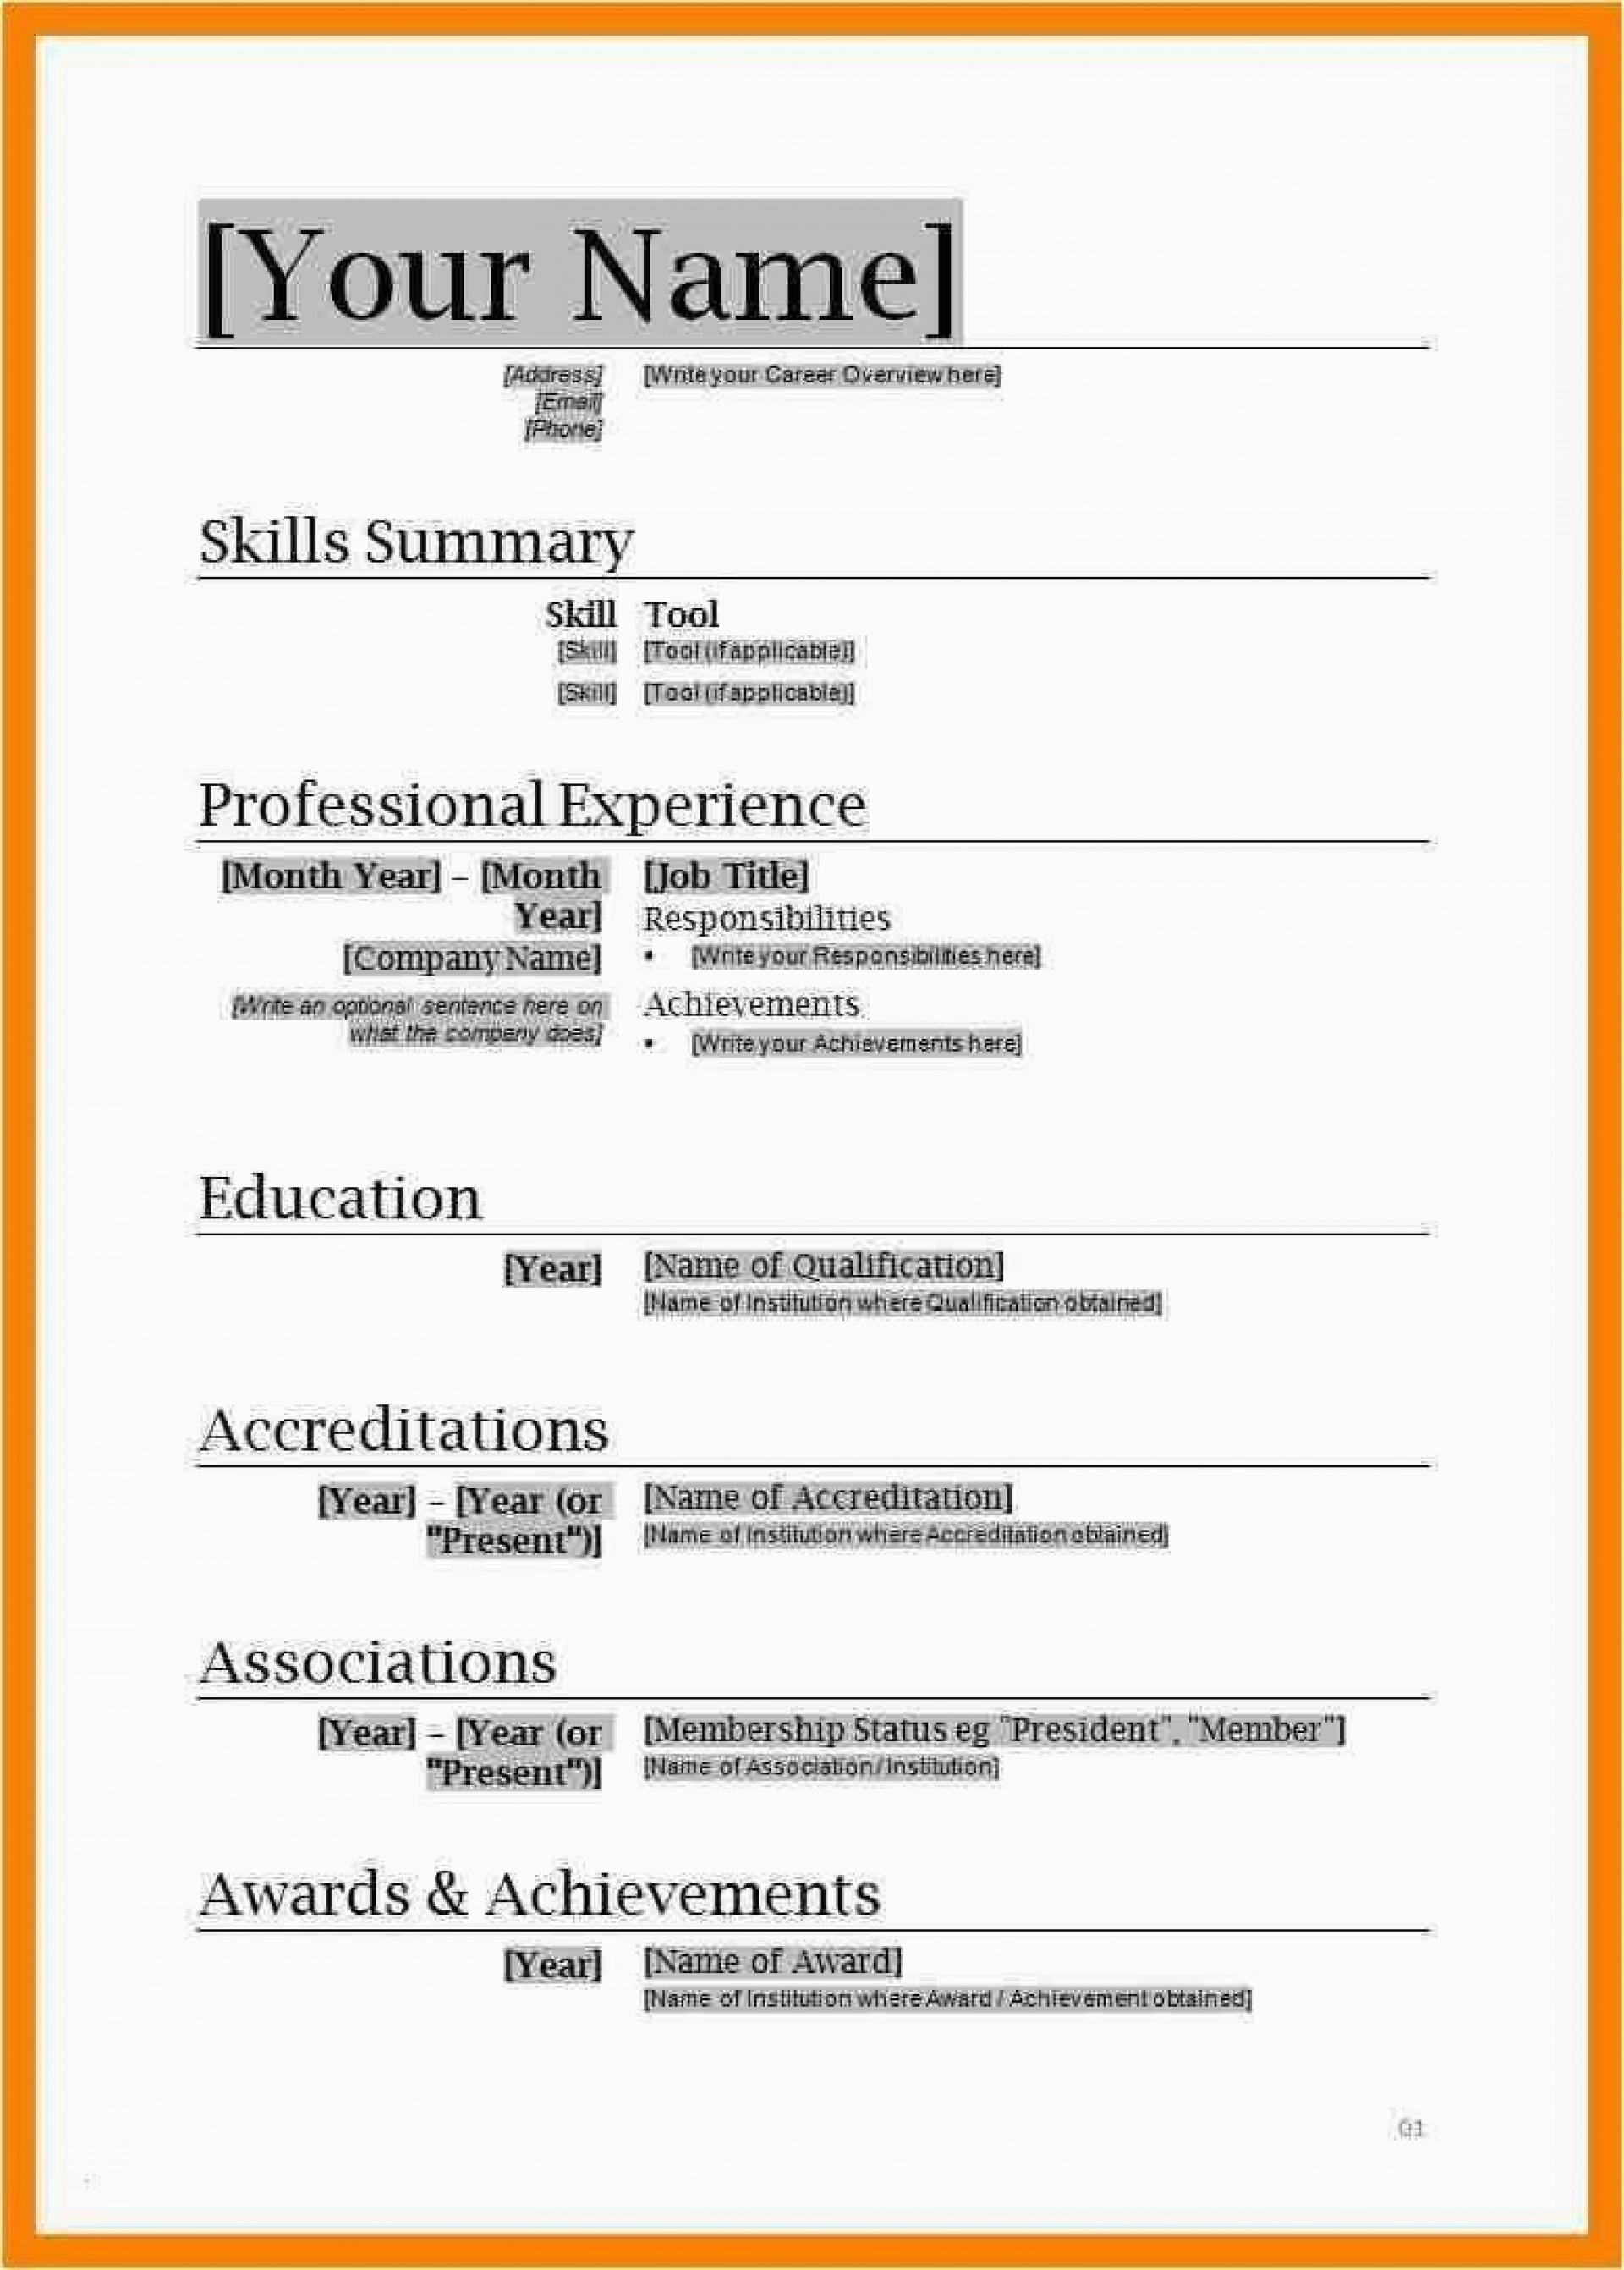 001 Fascinating Free Professional Resume Template Microsoft Word Sample  Cv 20101920